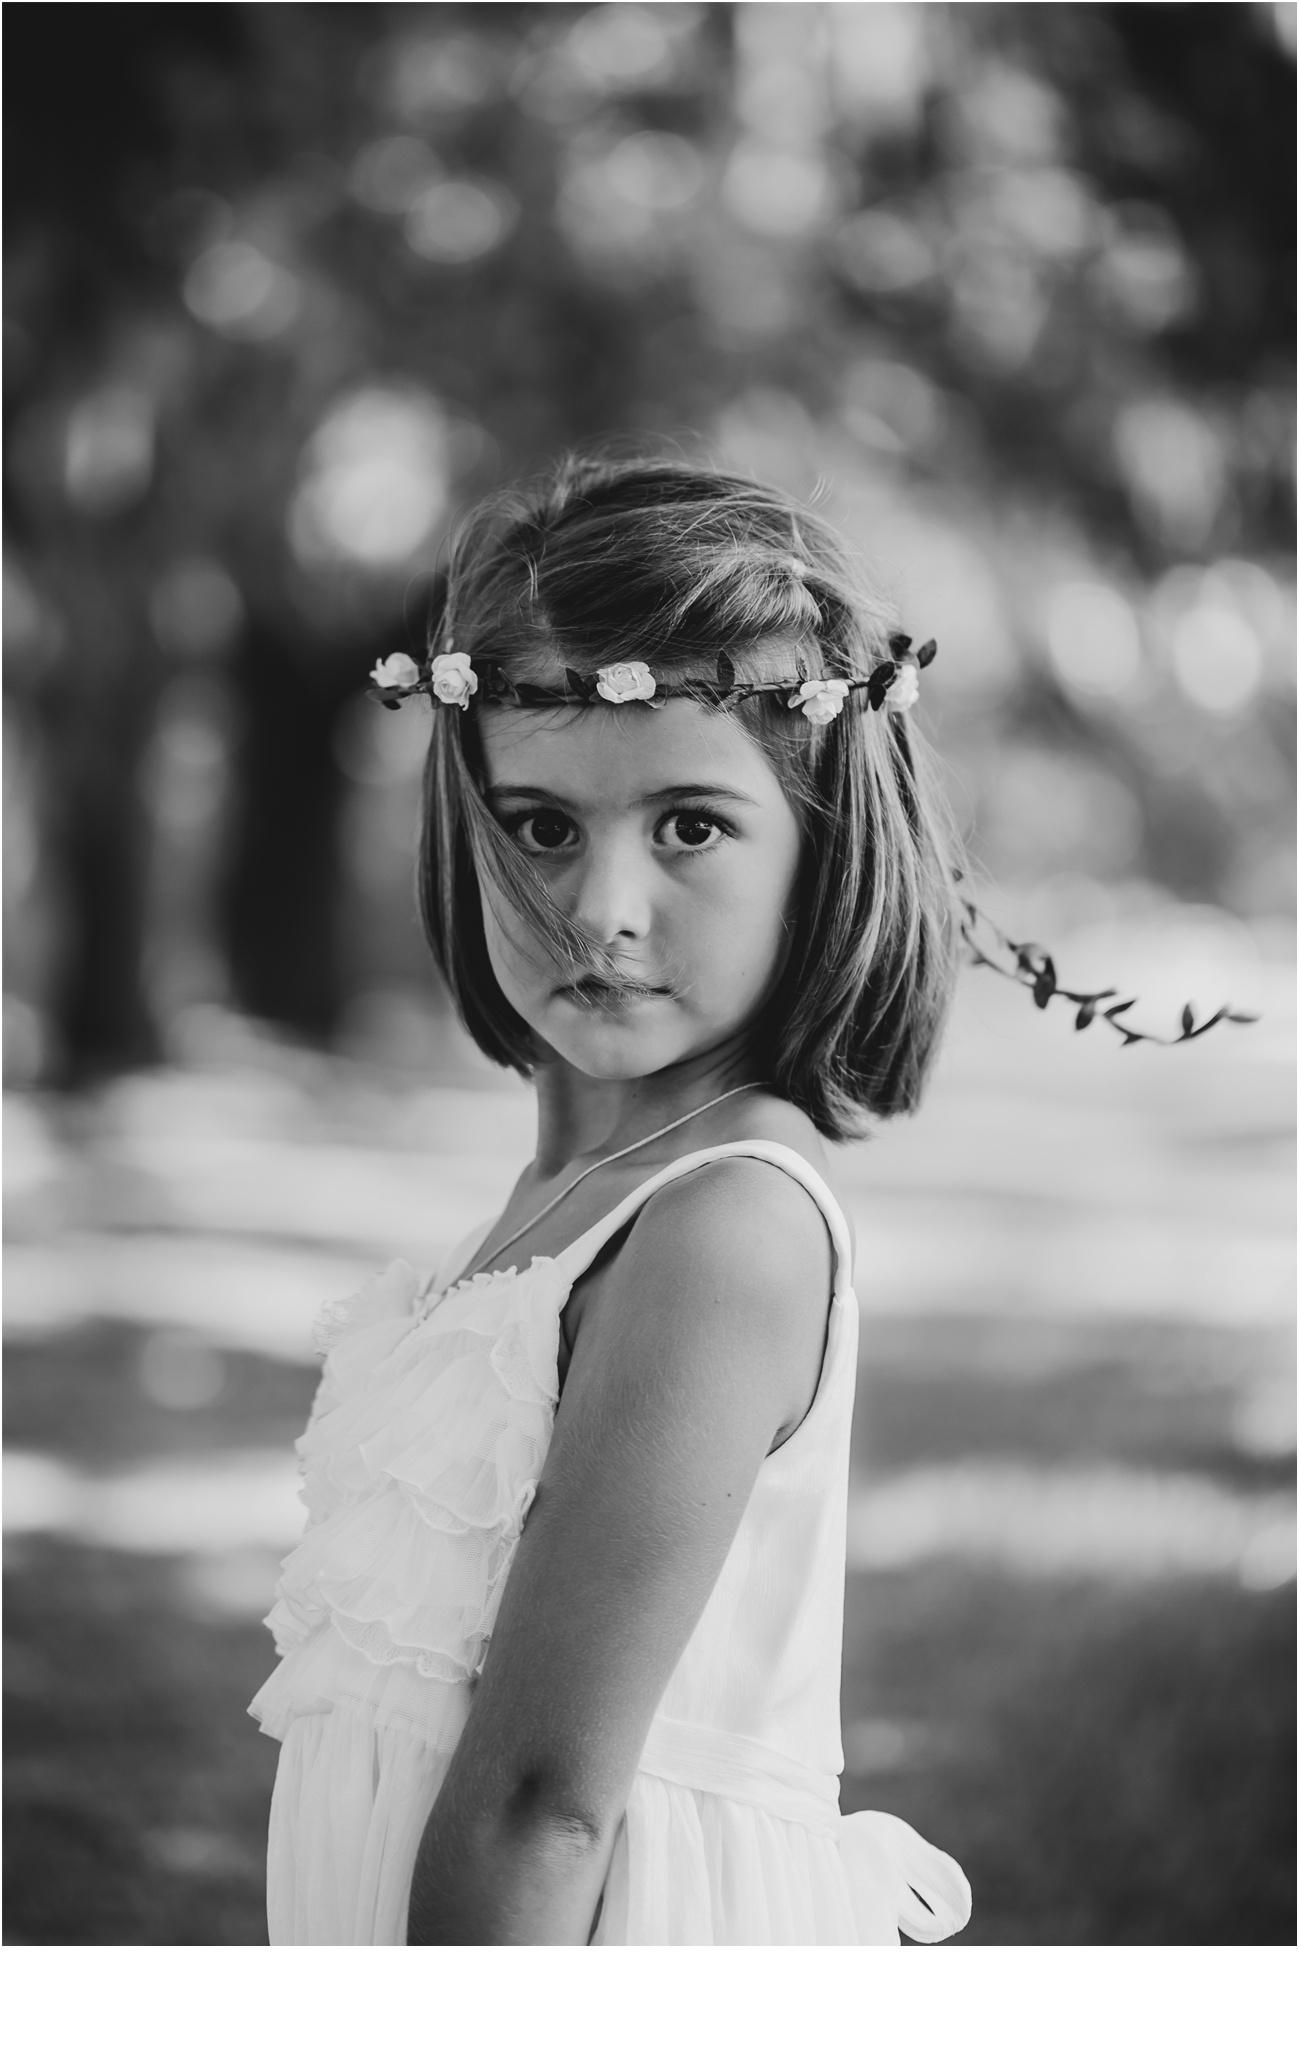 Rainey_Gregg_Photography_St._Simons_Island_Georgia_California_Wedding_Portrait_Photography_1114.jpg